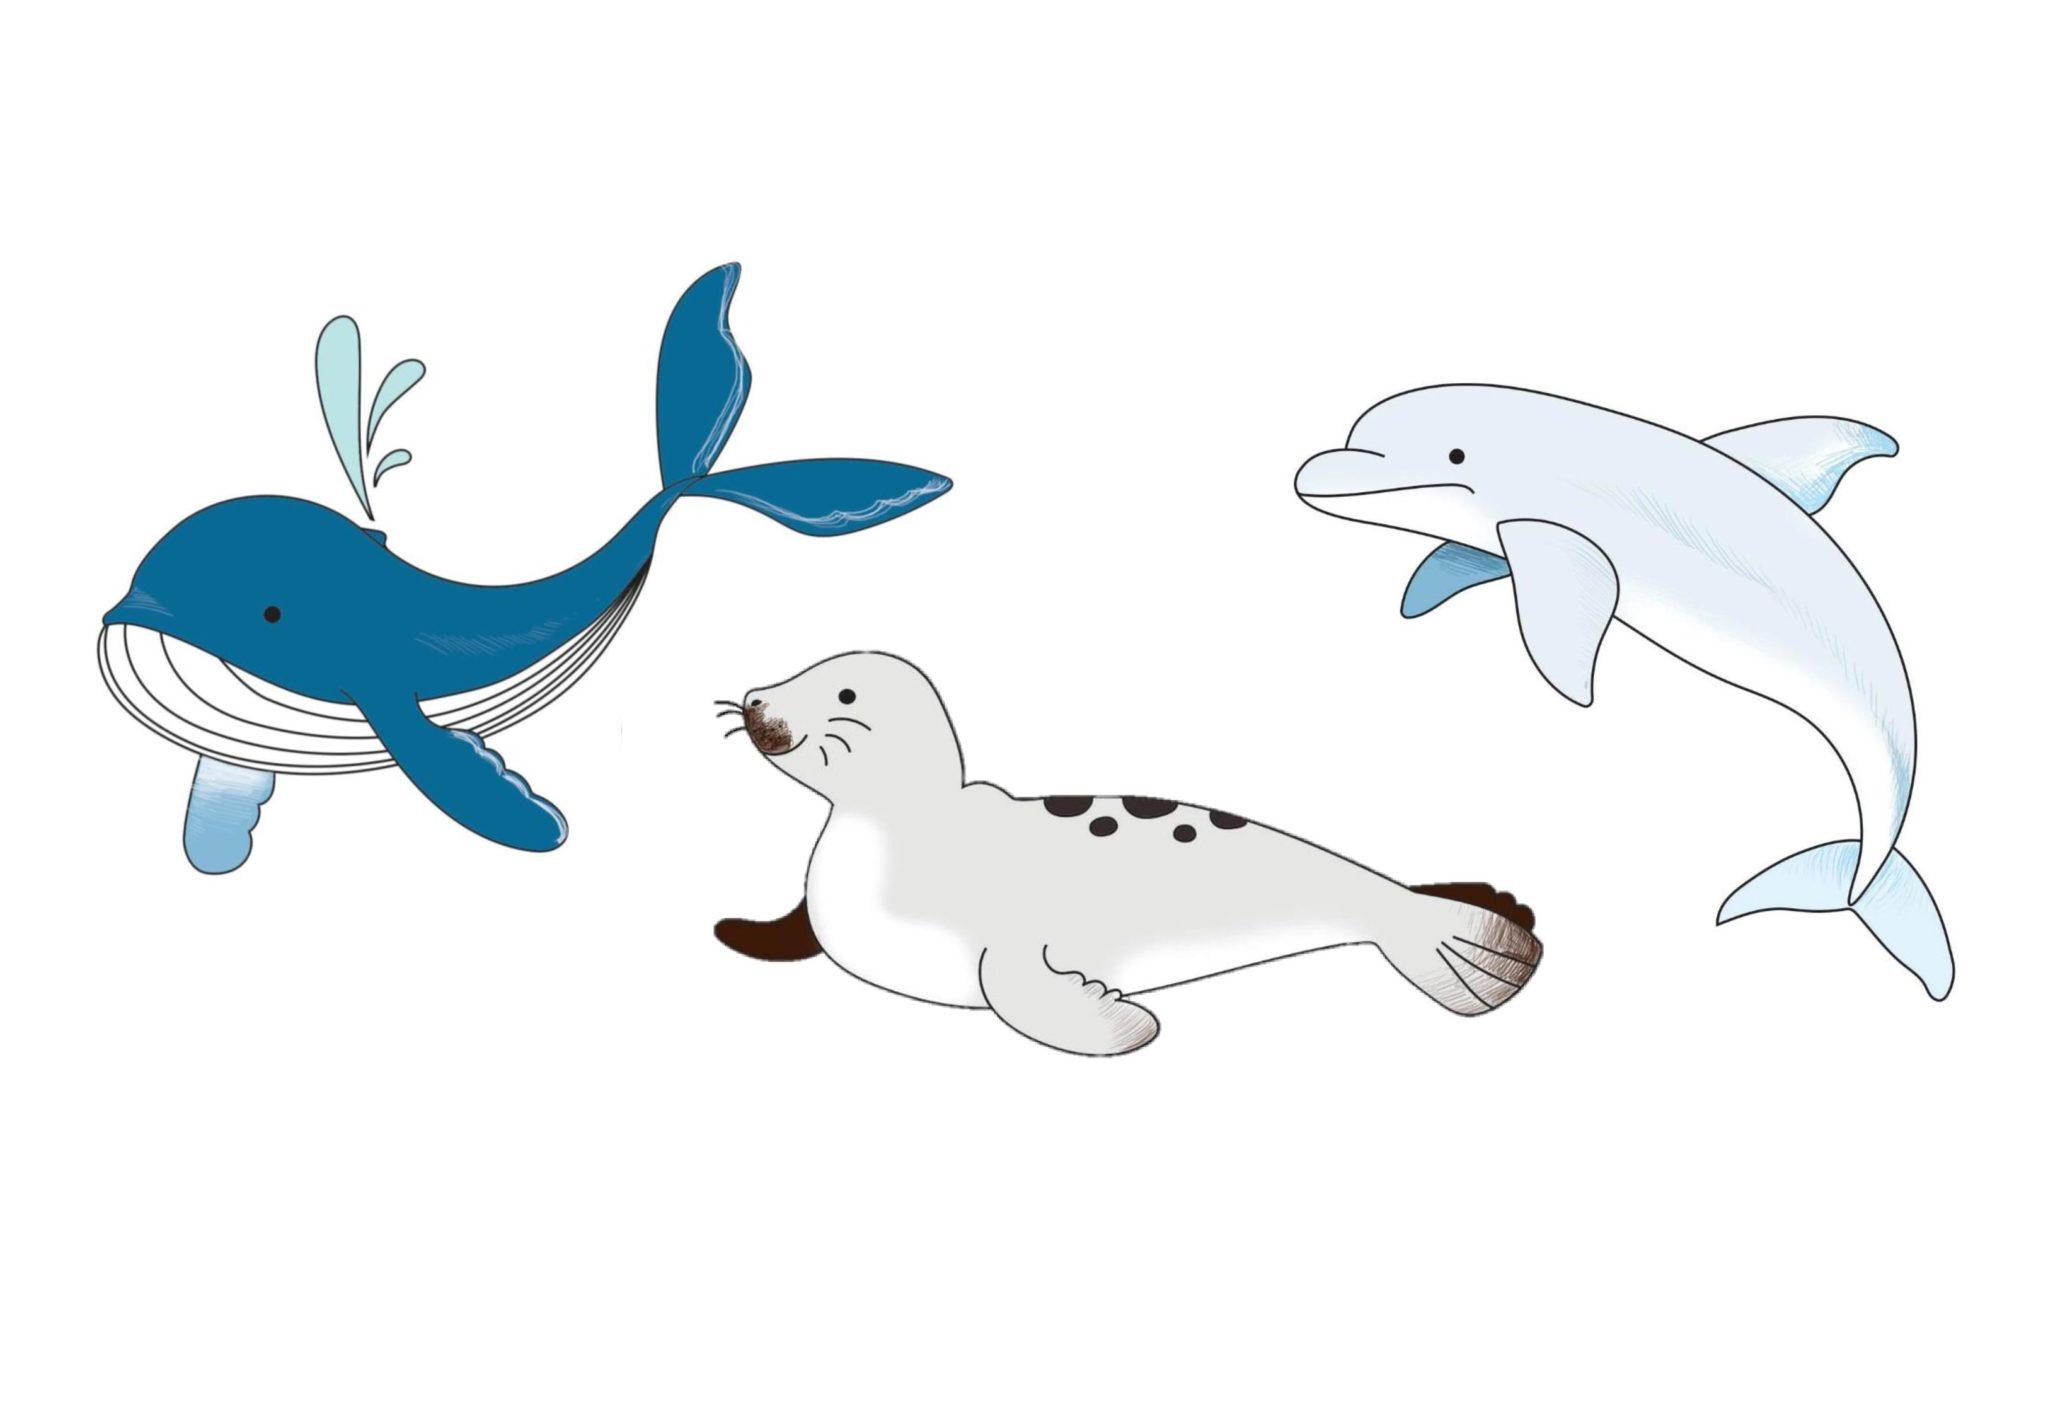 Apprendre A Dessiner Des Animaux Marins En 5 Etapes